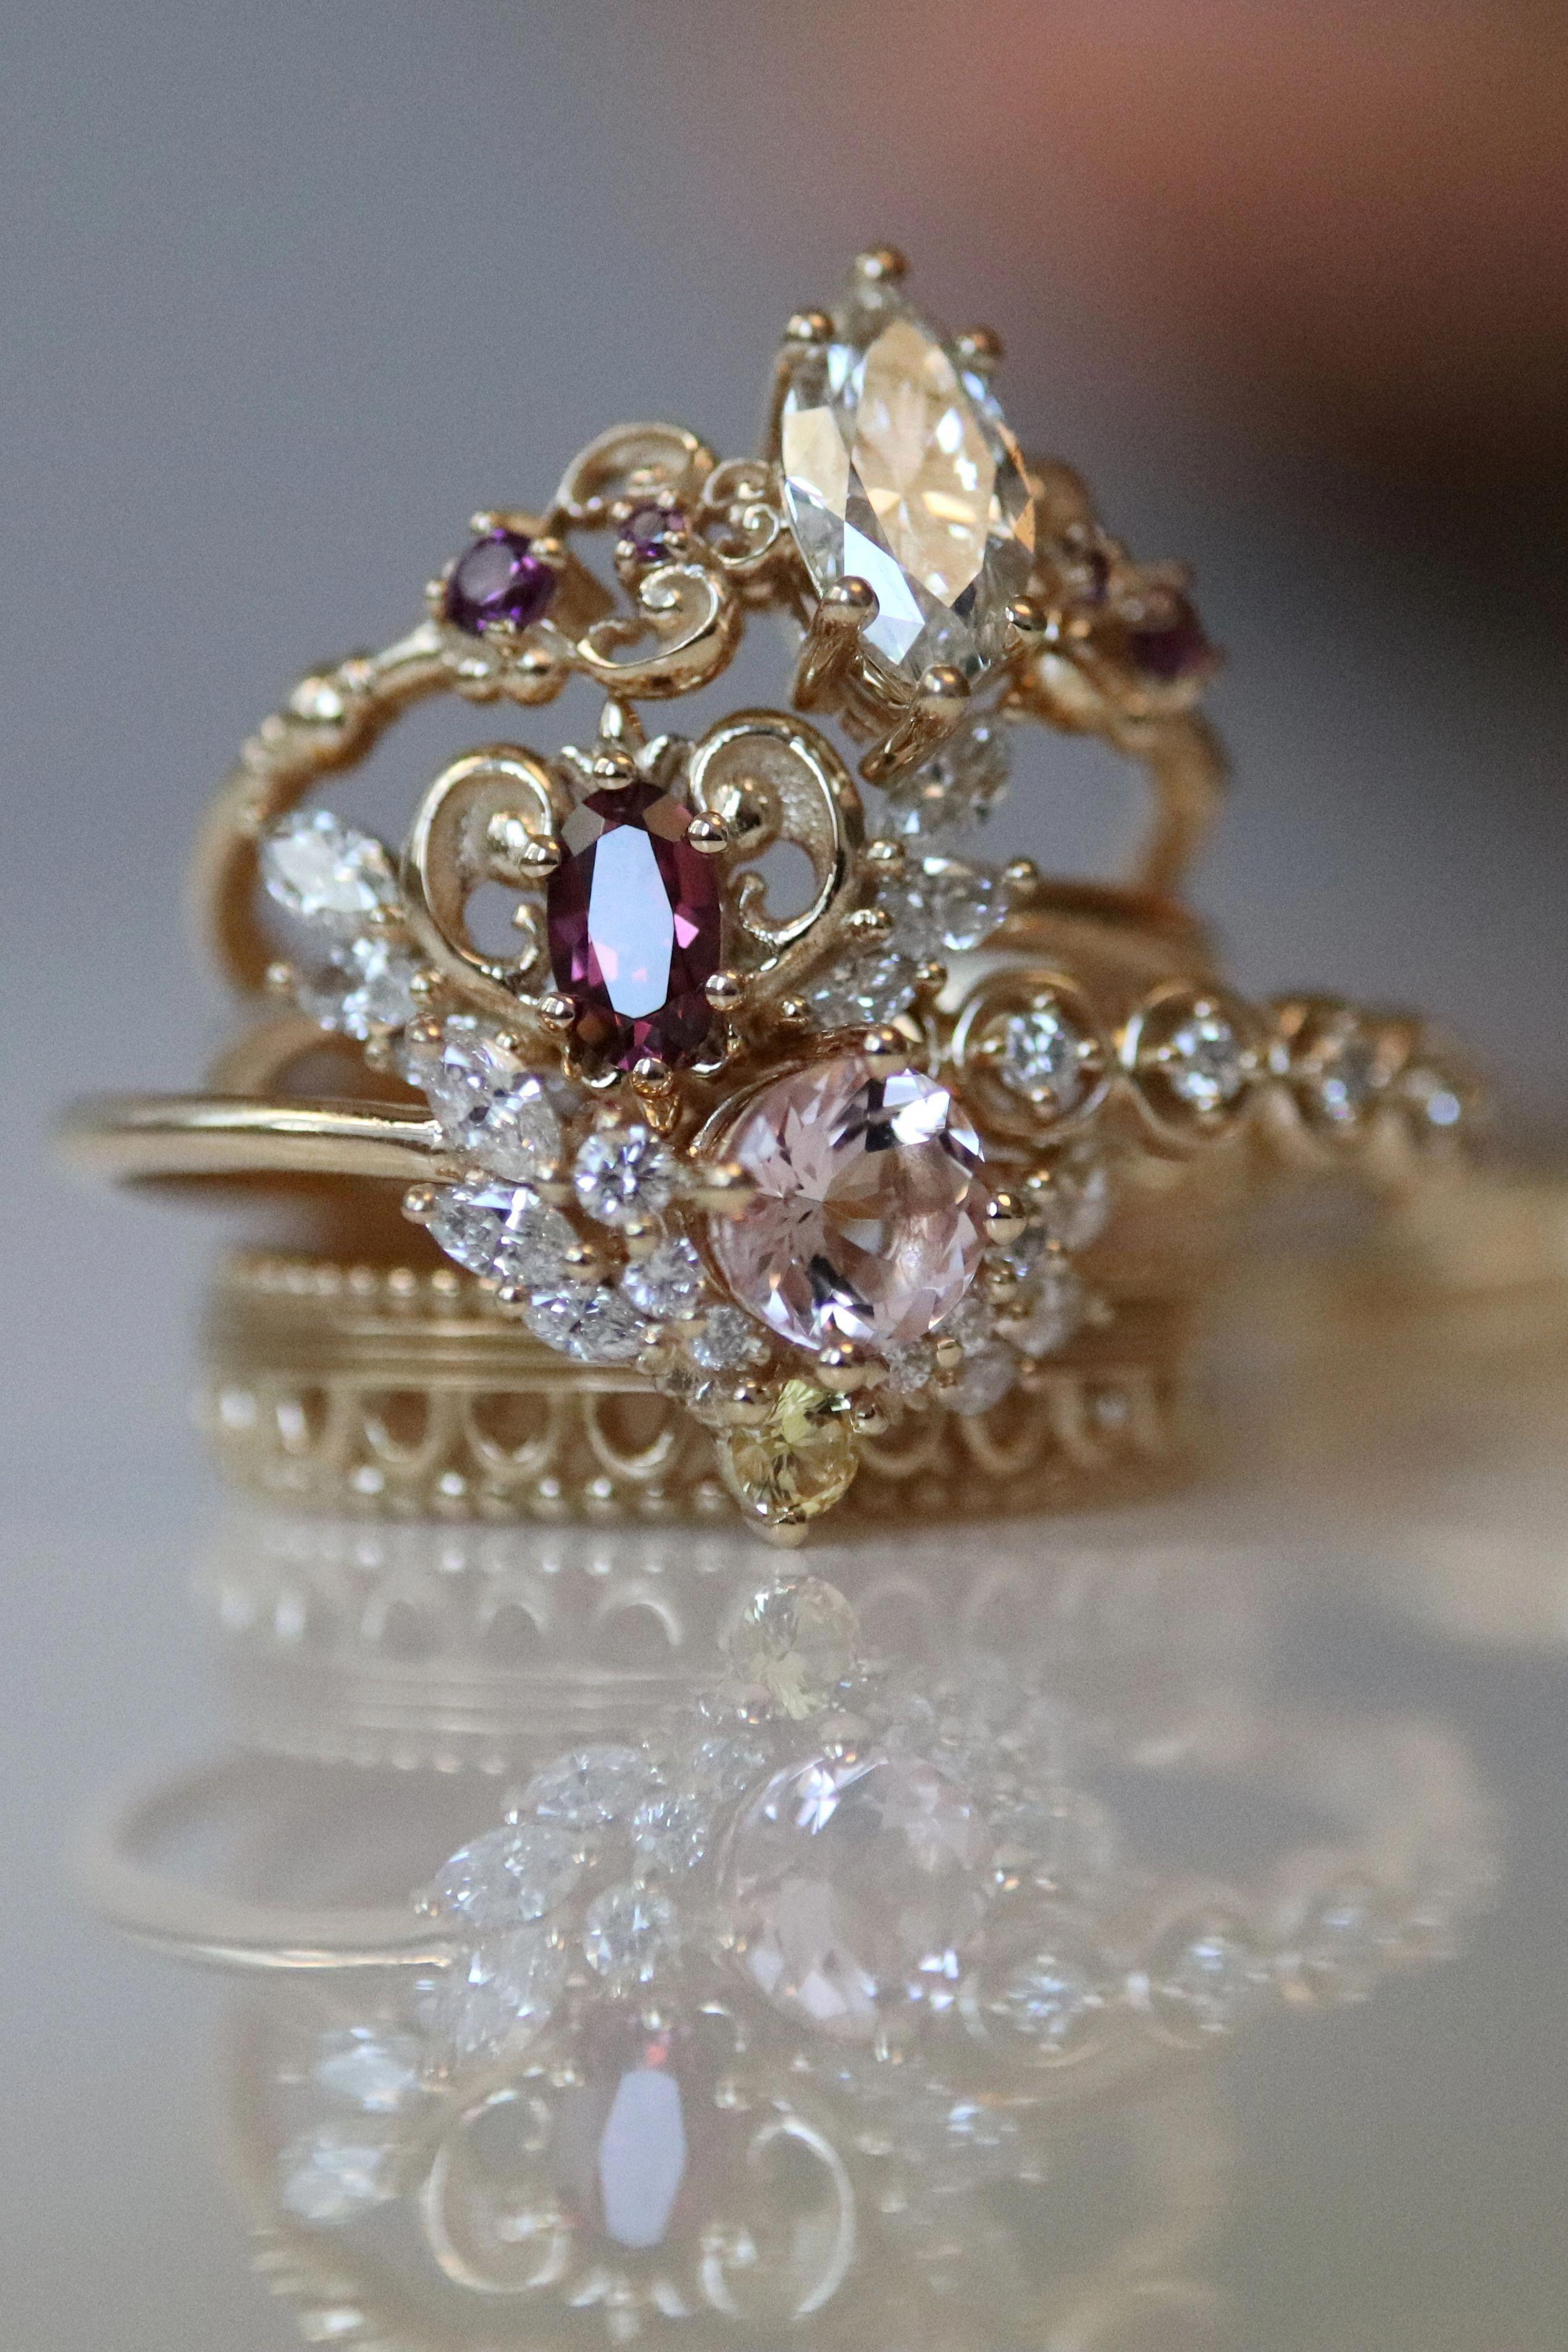 Star Setting Diamond Ring, 14k Gold Wedding Band with